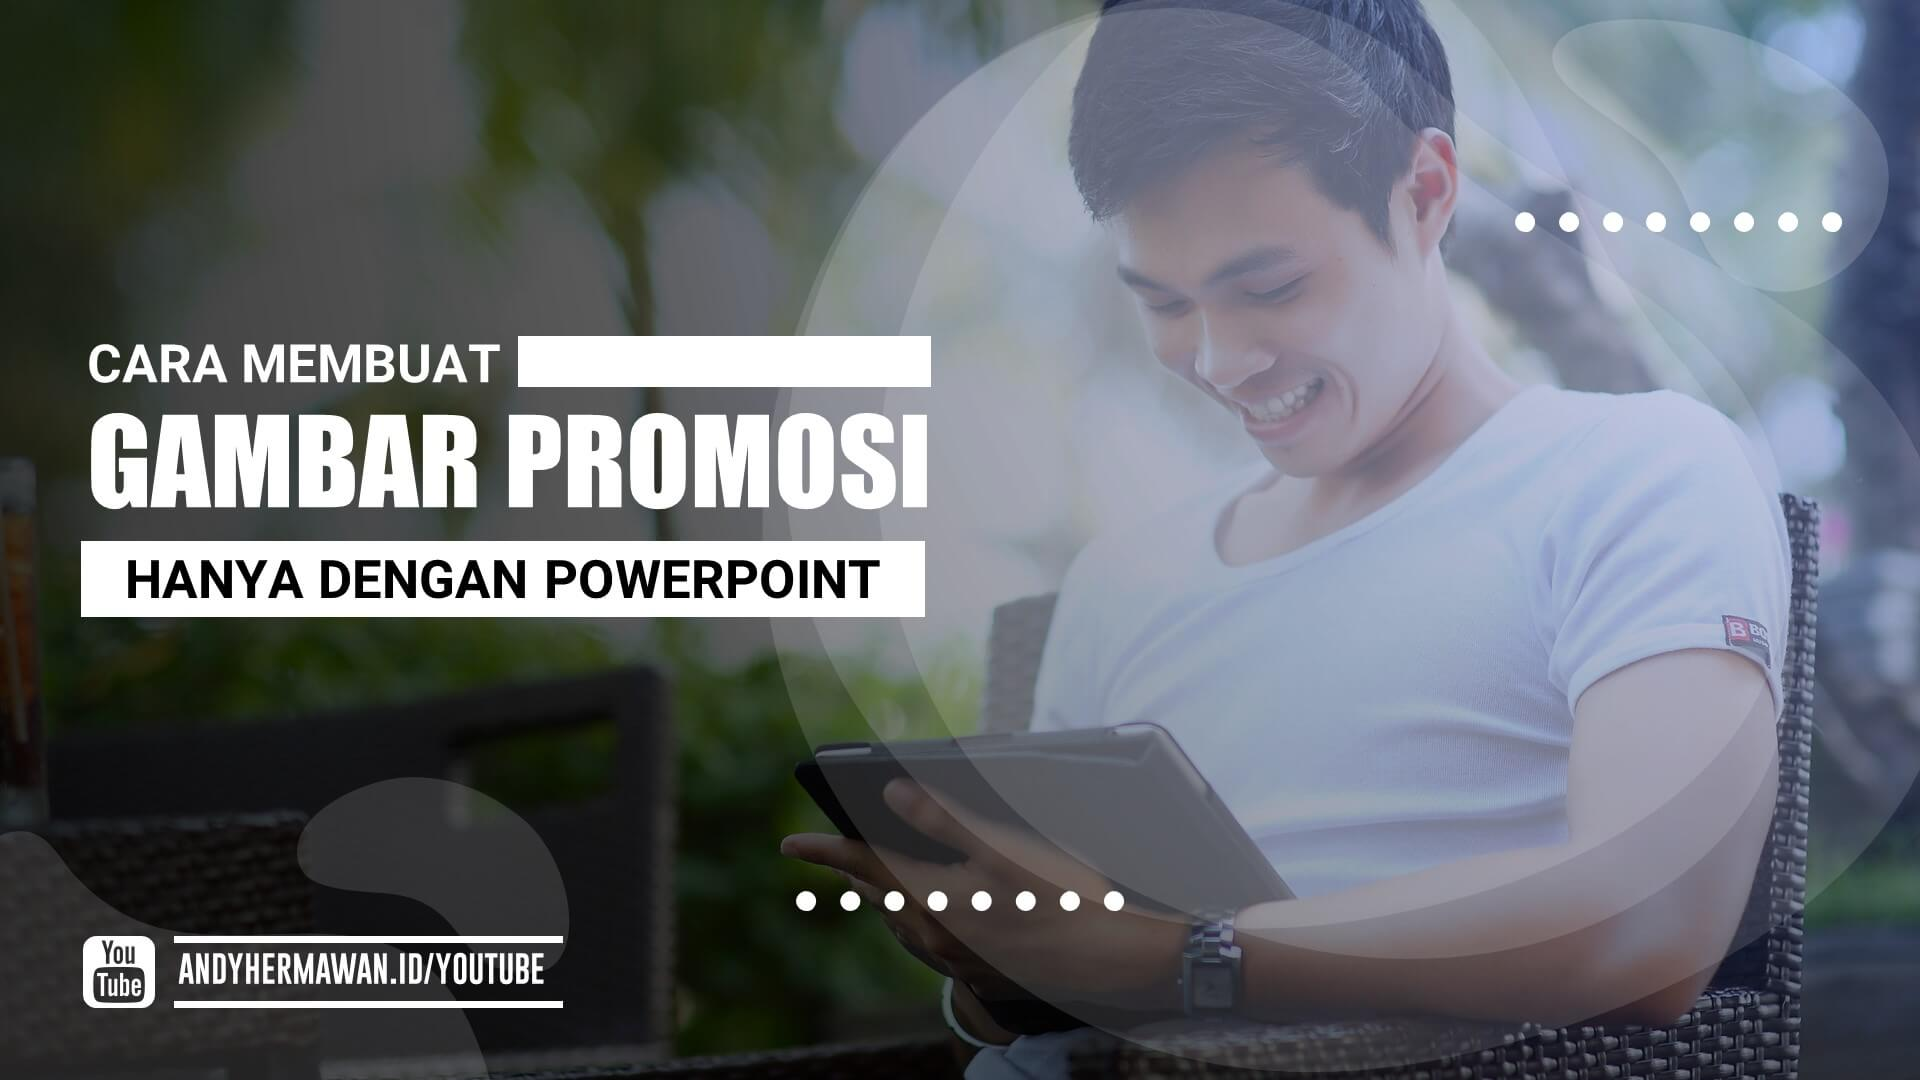 Cara Membuat Gambar Promosi Iklan Dengan Powerpoint Panduan